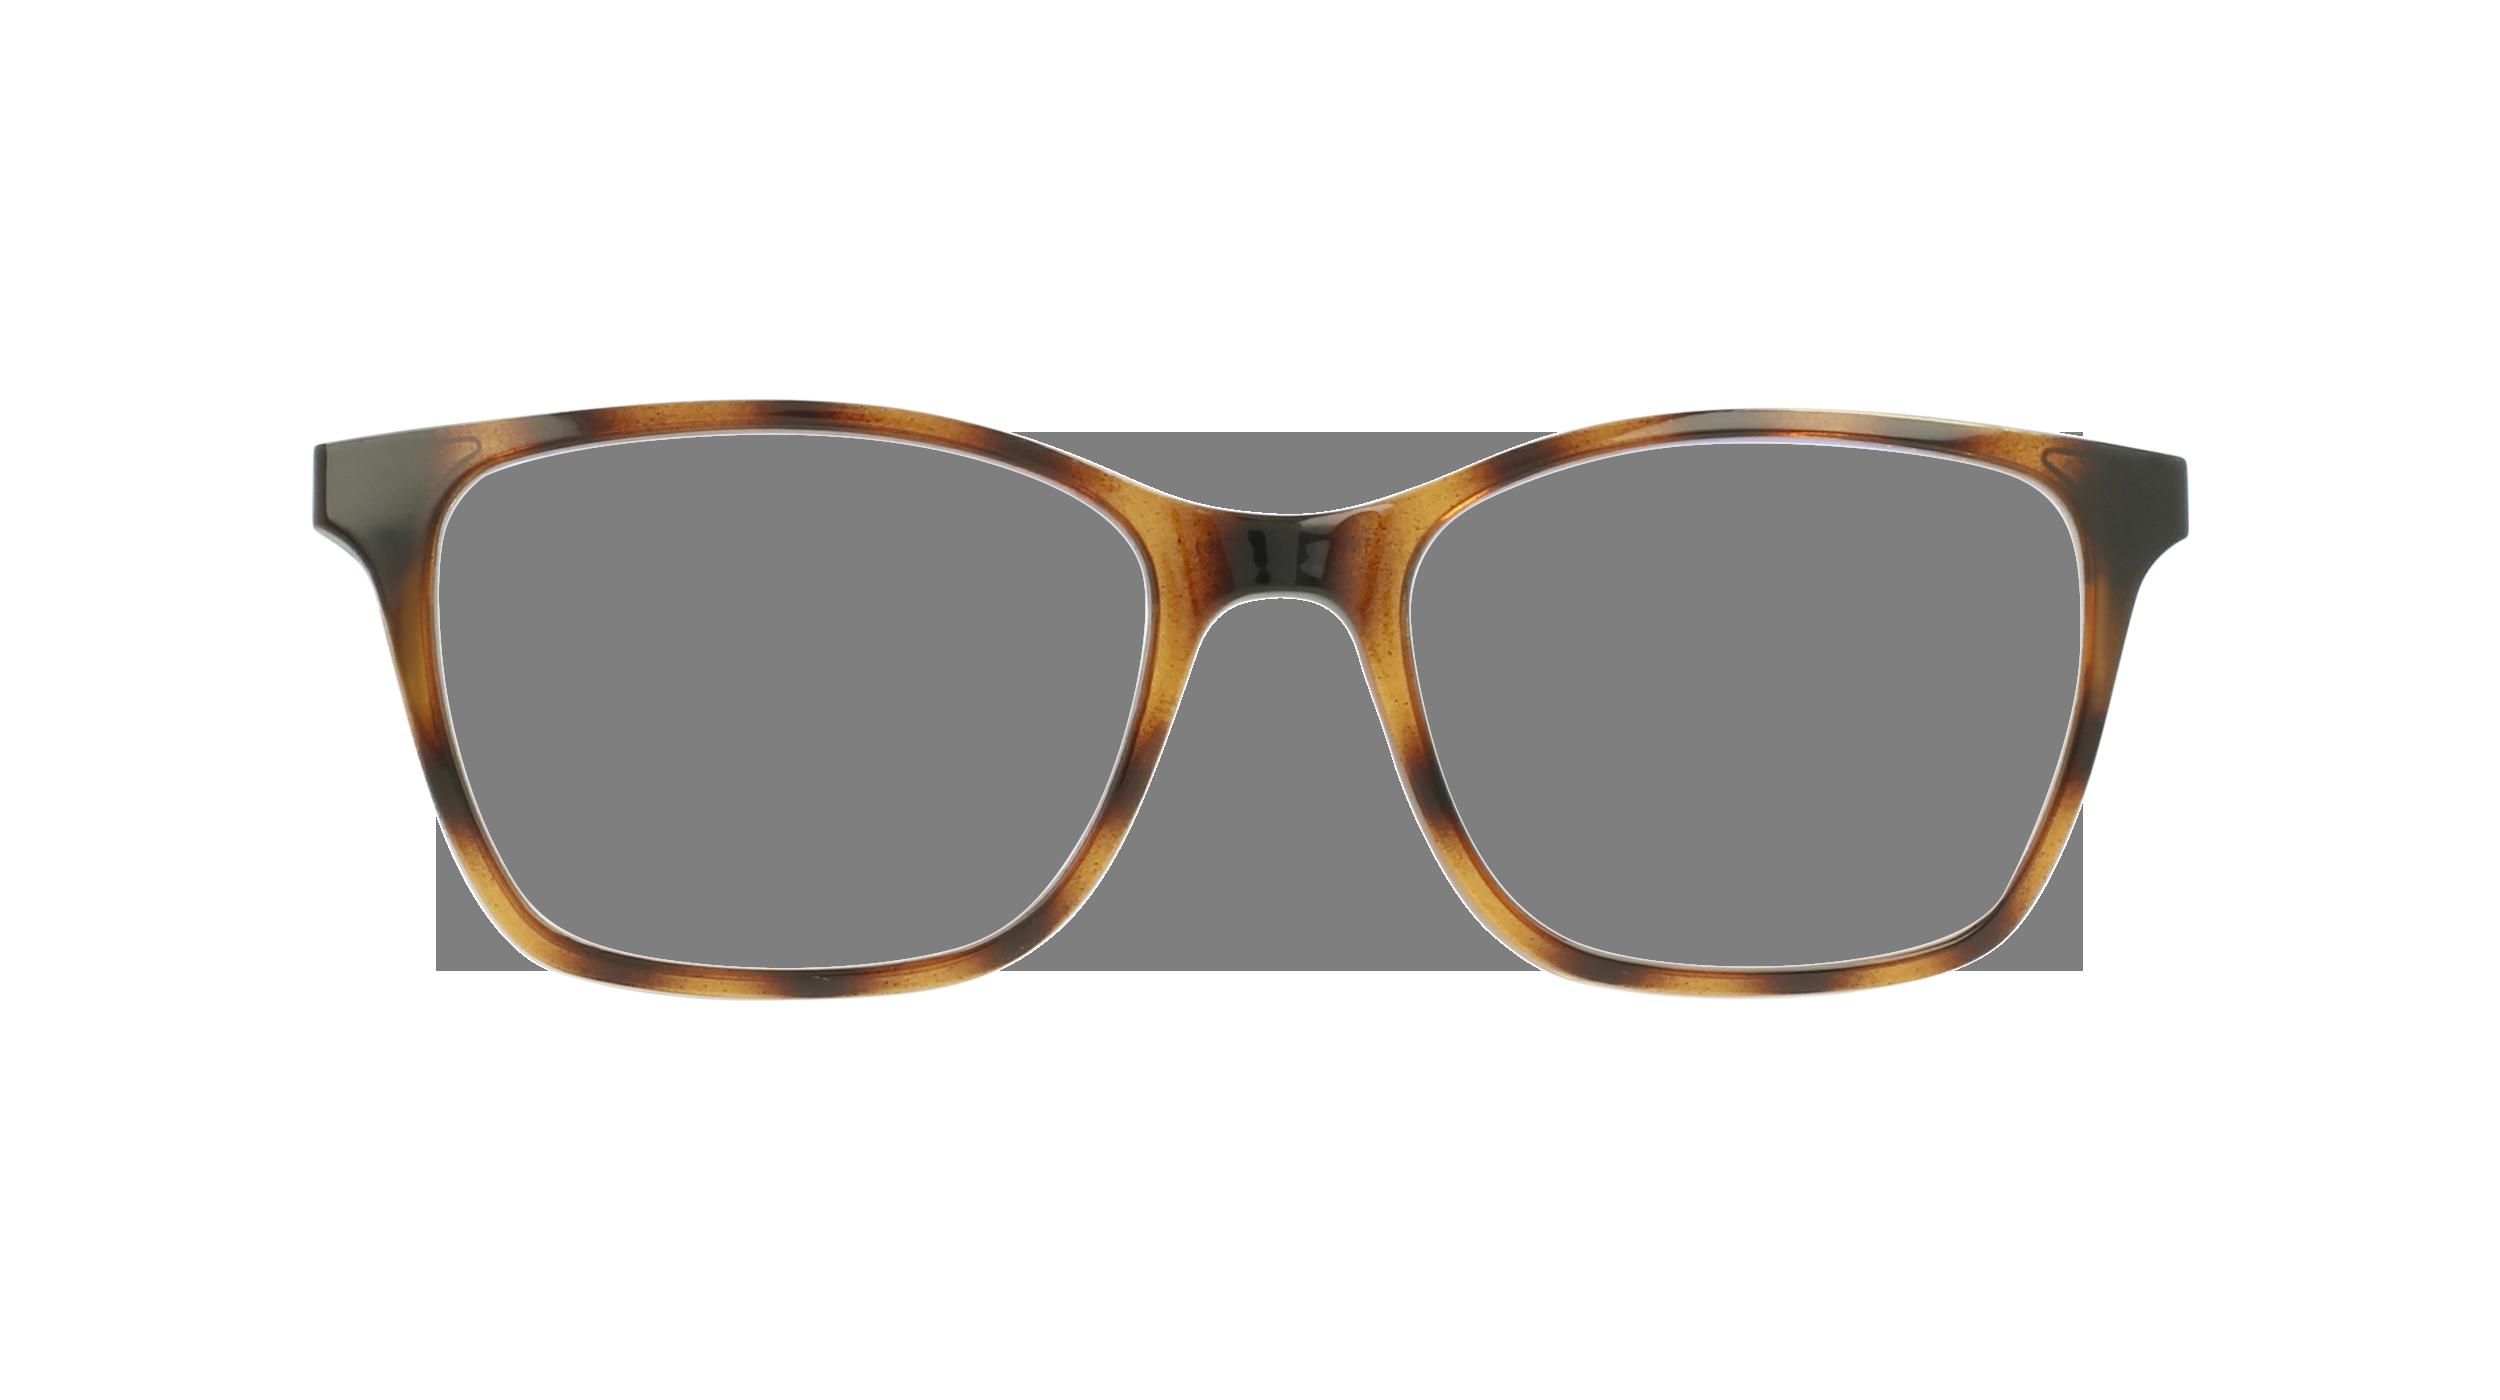 afflelou/france/products/smart_clip/clips_glasses/07630036457610.png